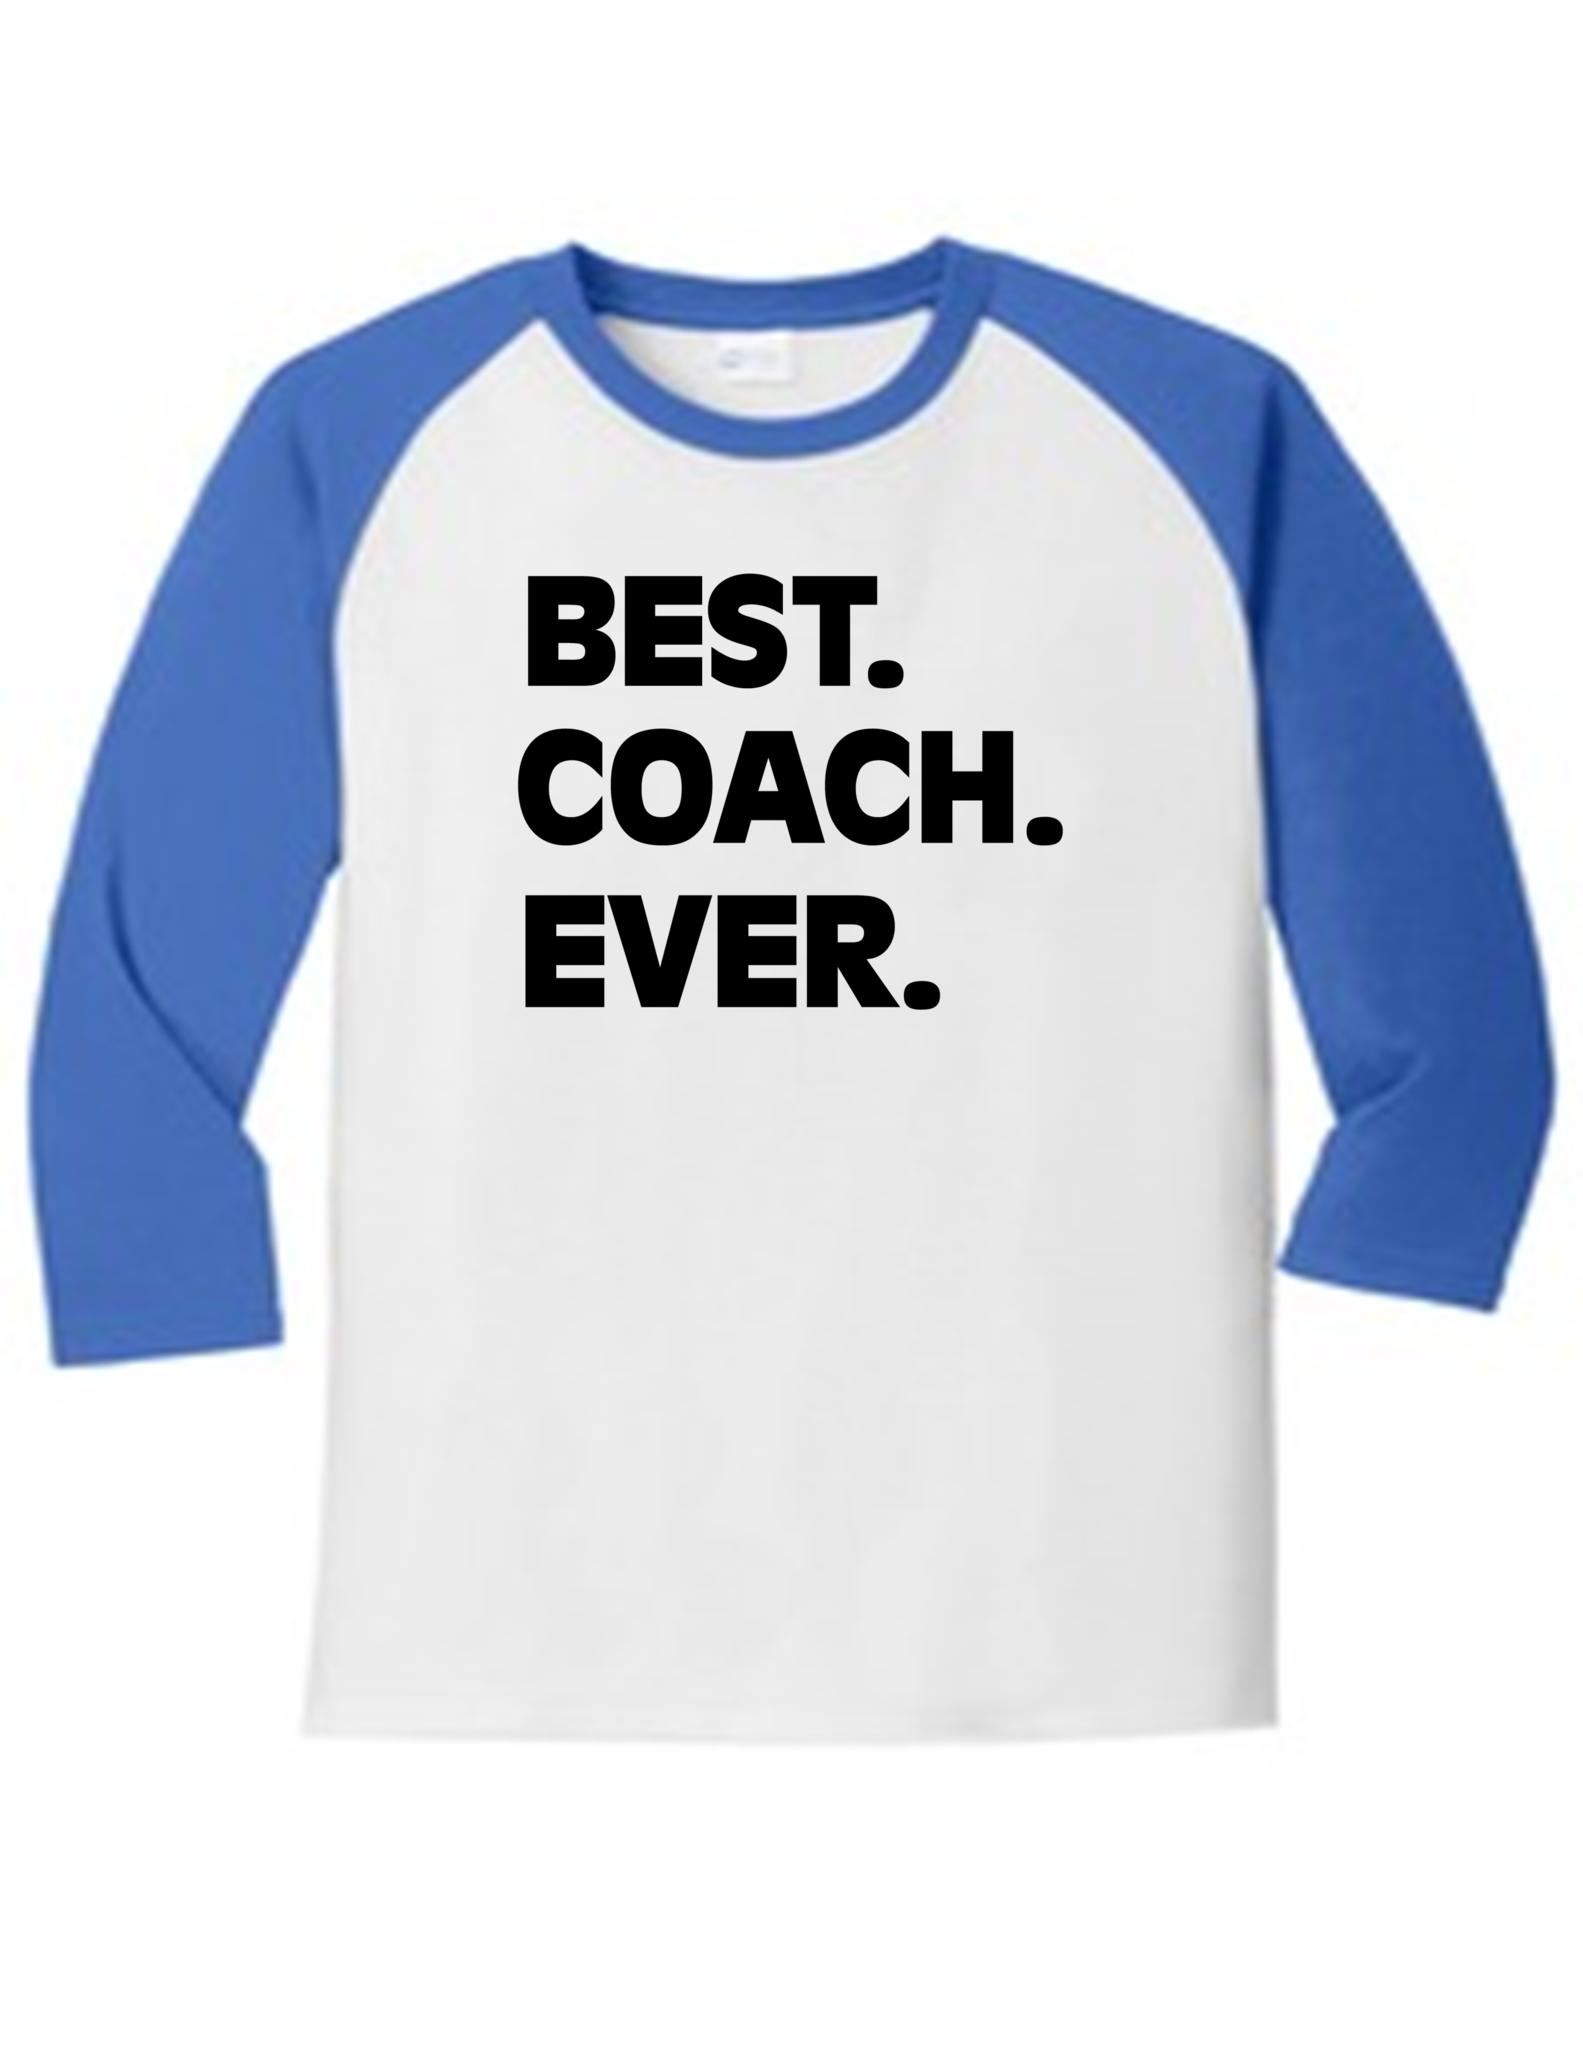 556529eea Best Coach Ever. Football Makes Me Happy 5700 Raglan T Shirt Slogan Humorous  White Red Large, Men's Funny